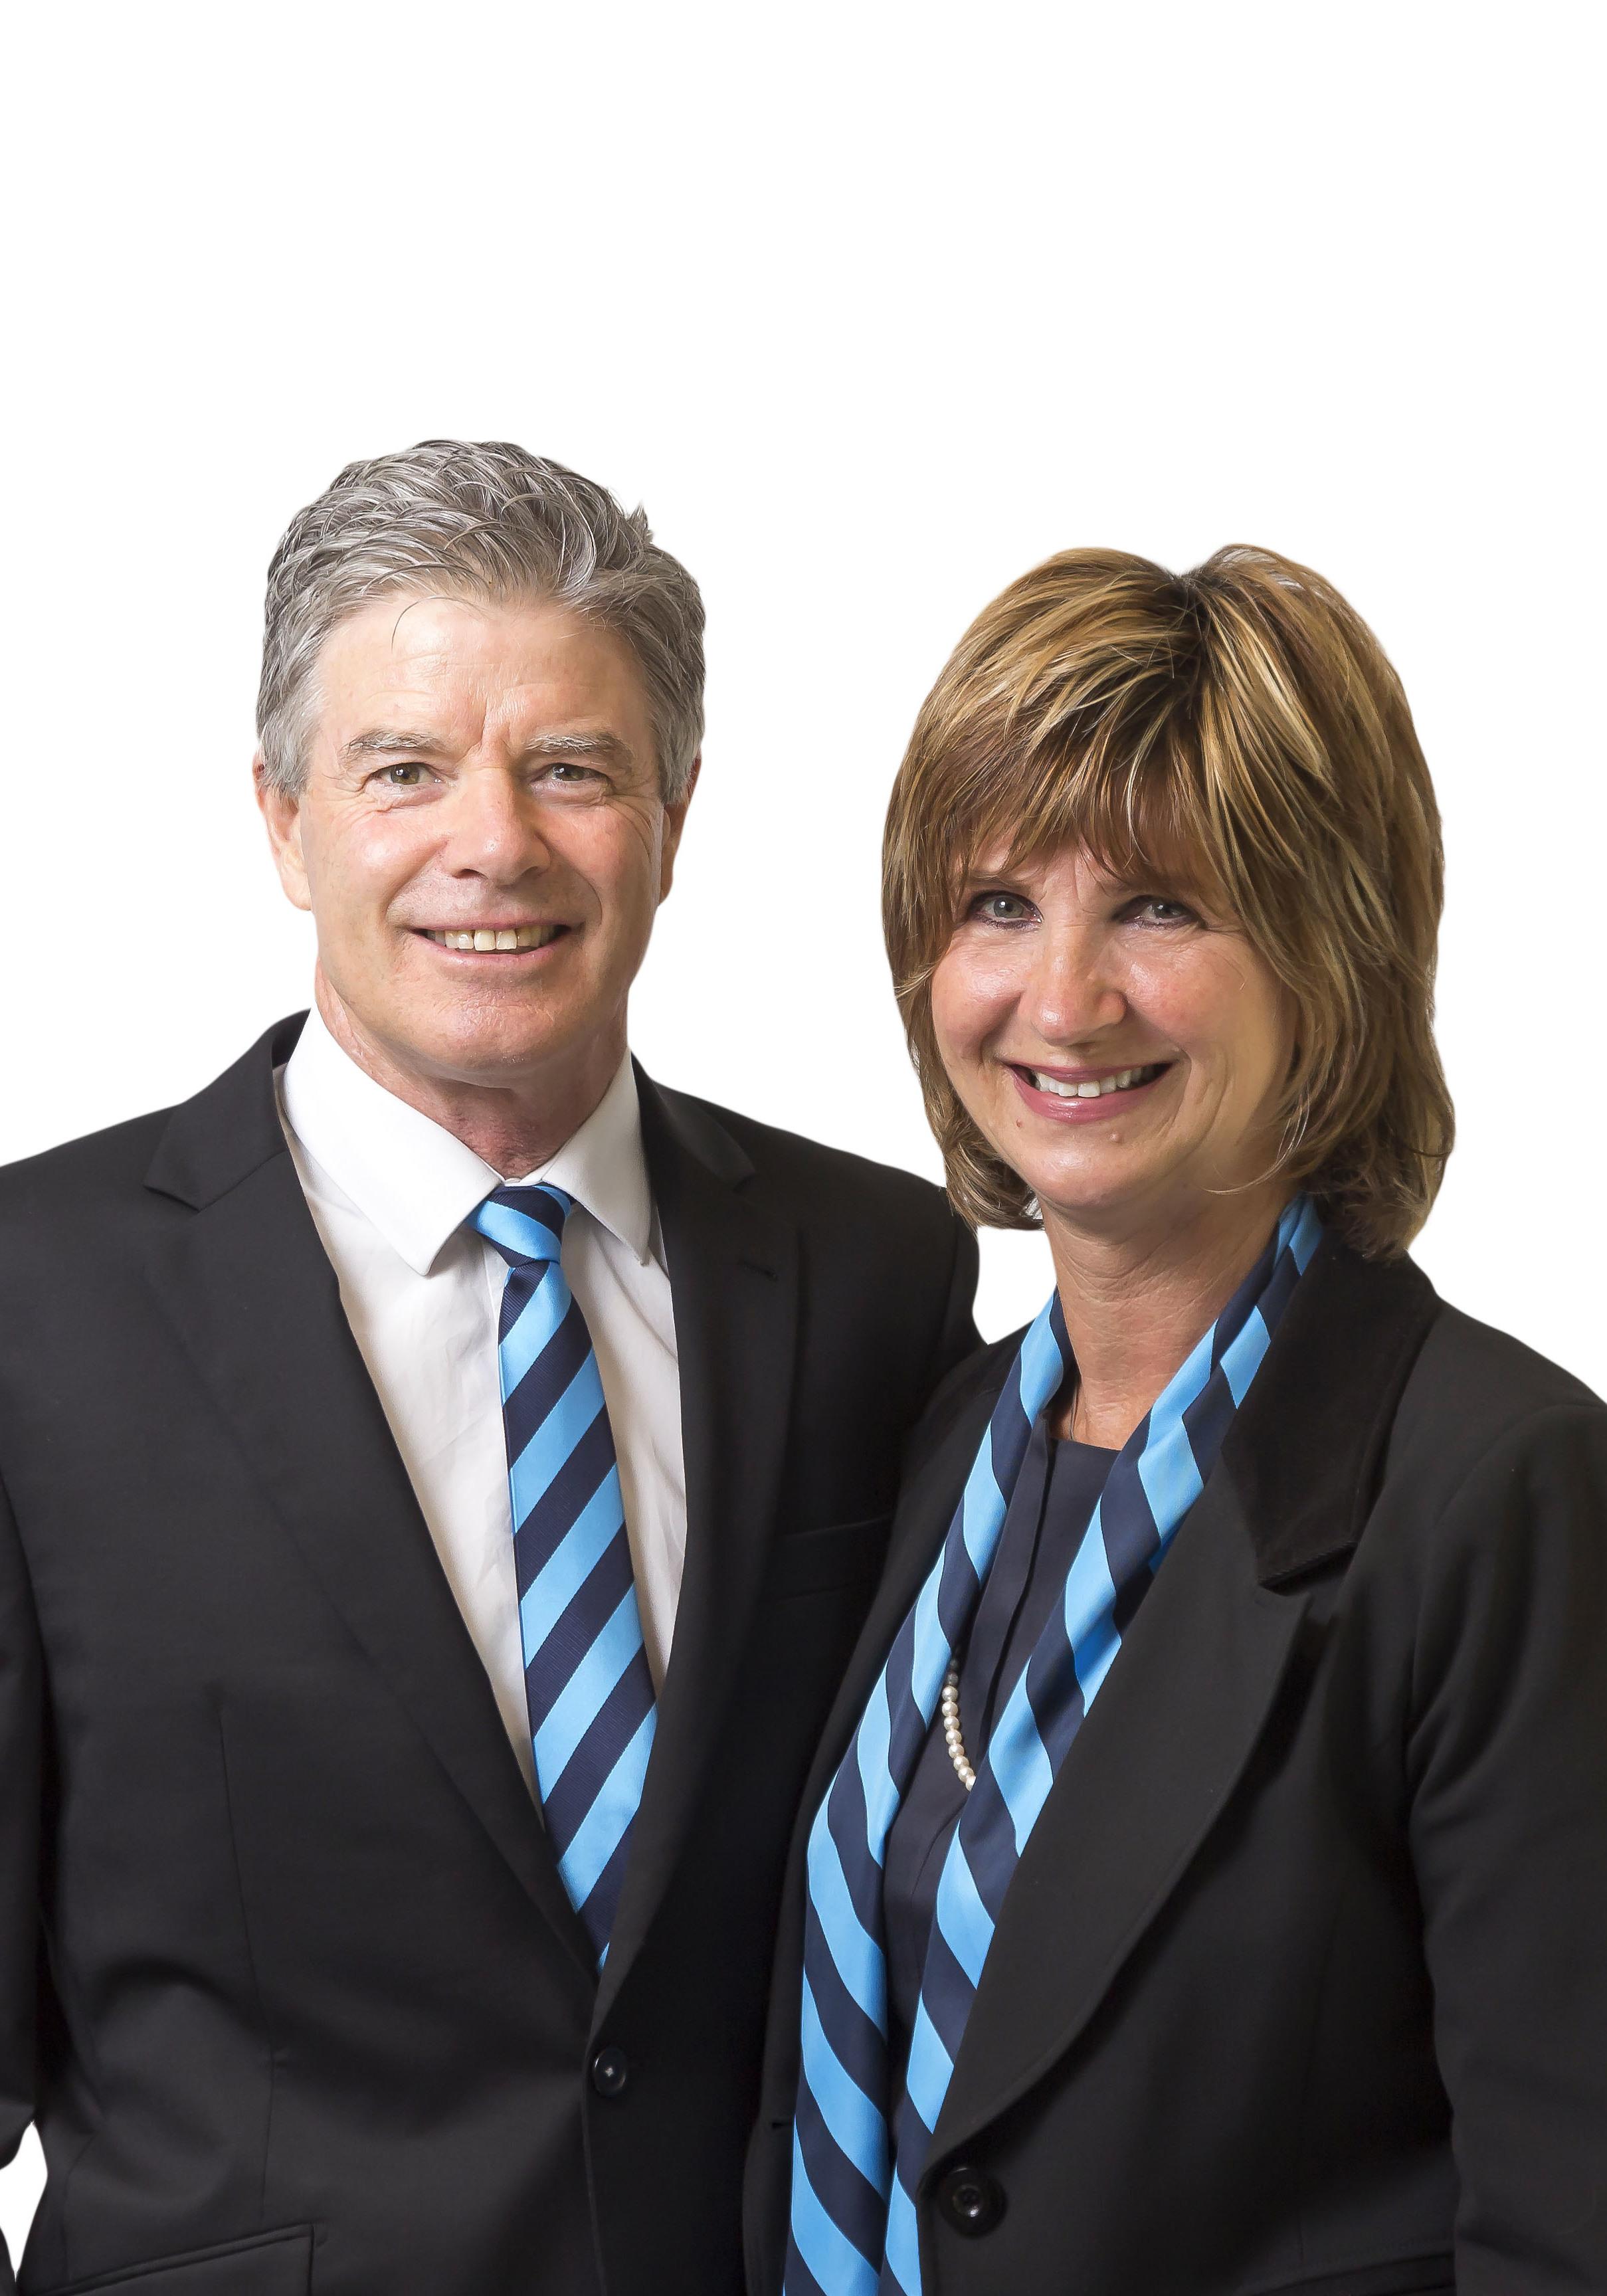 Matthew and Christina Hindle